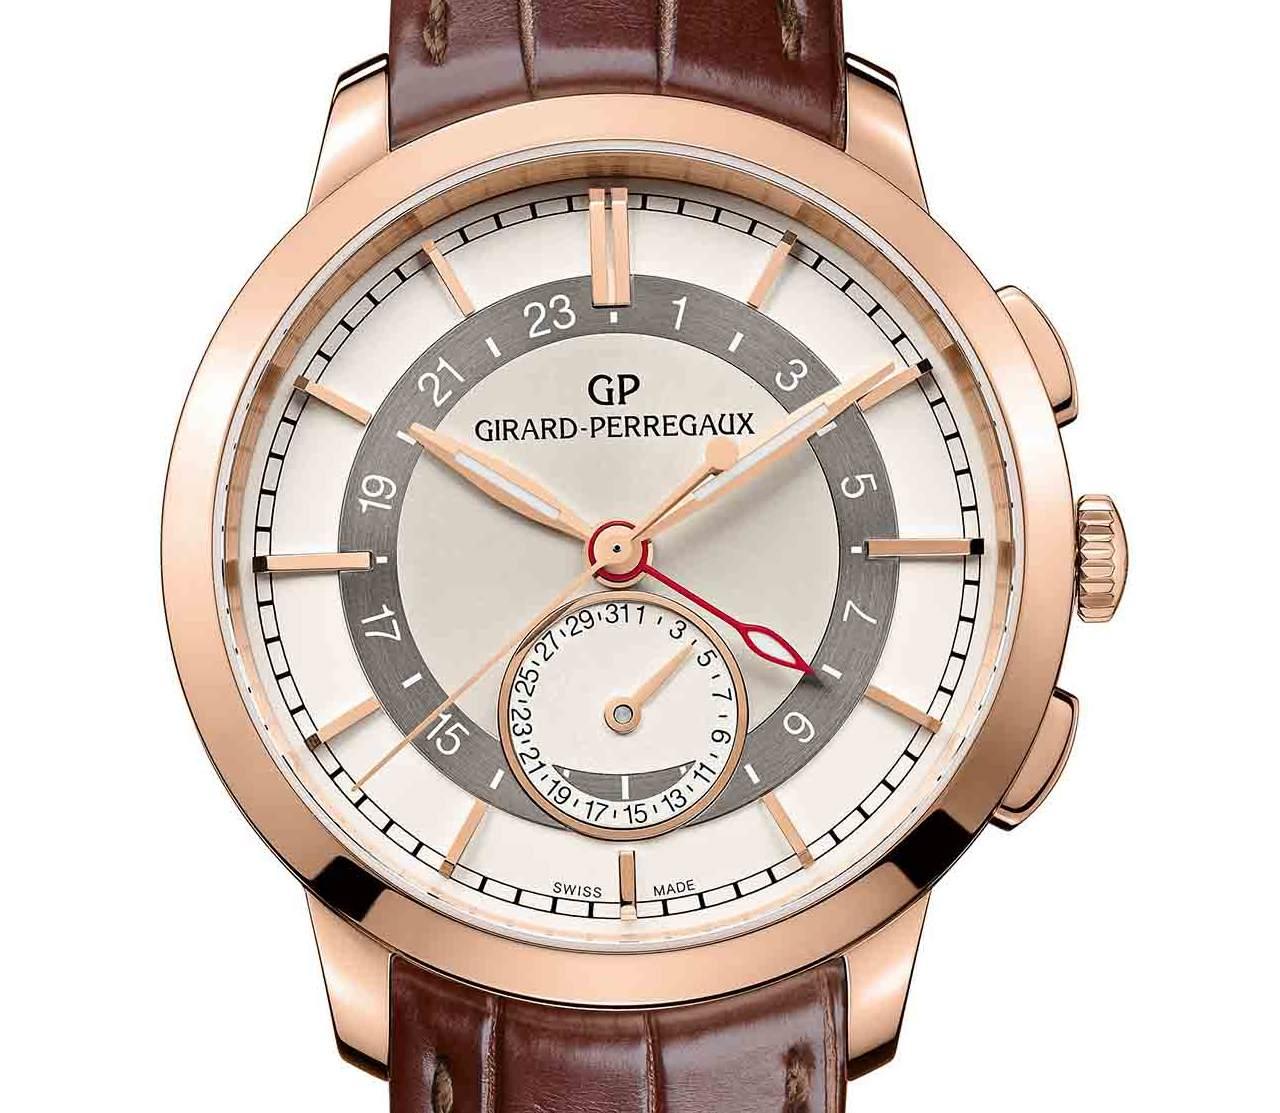 girard-perregaux-1966-dual-time-ref-49544-52-131-bbb0-ref-49544-52-231-bb60-prezzo-price-0-100_6